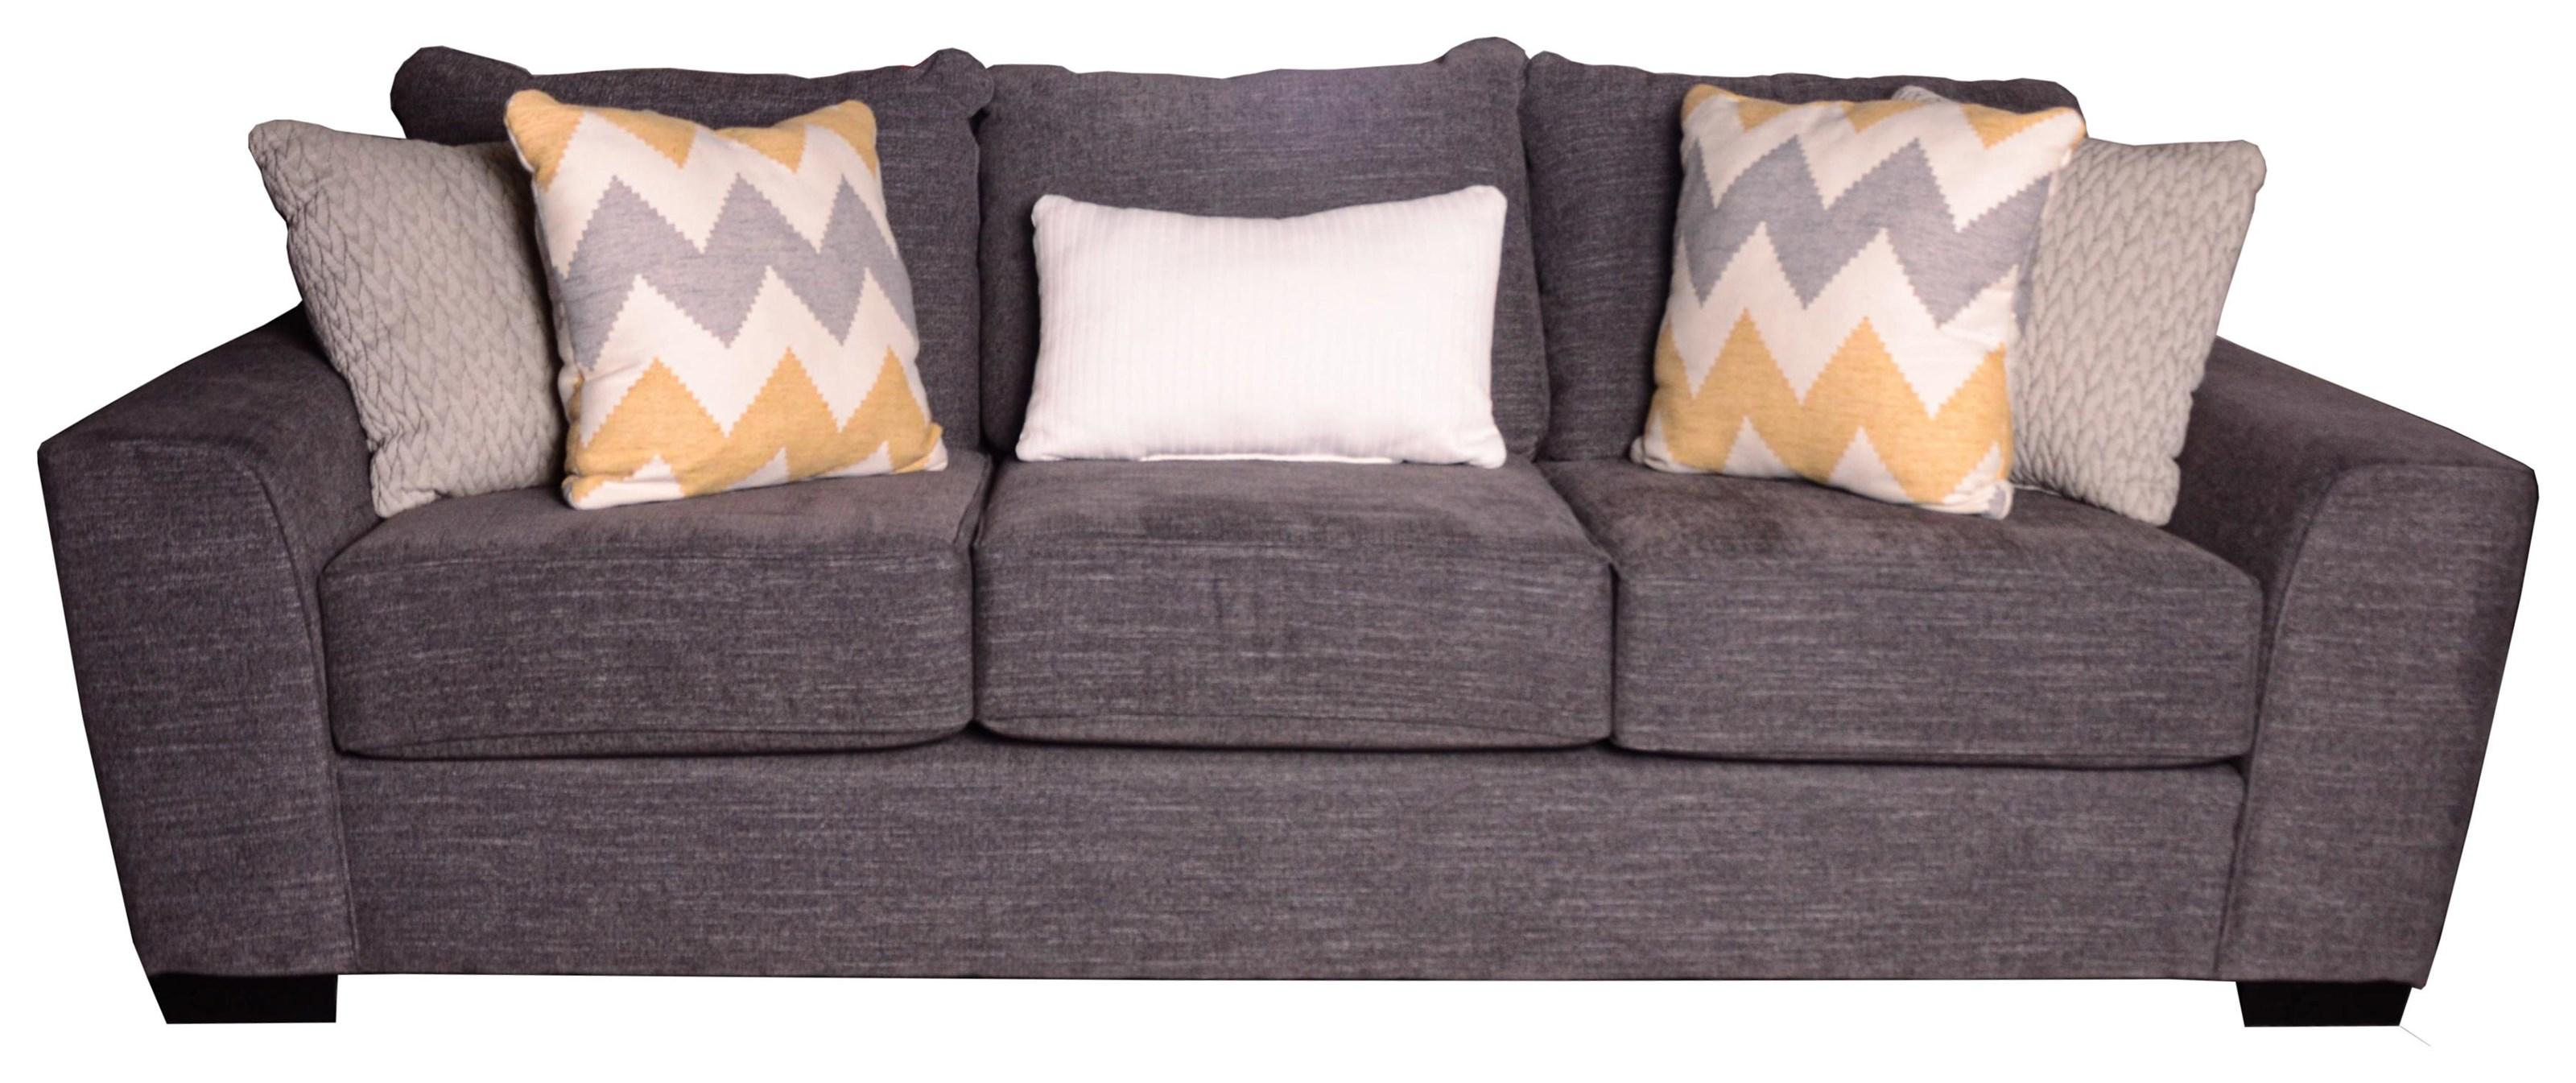 Desperado Curious Charcoal Sofa by Michael Nicholas at Beck's Furniture